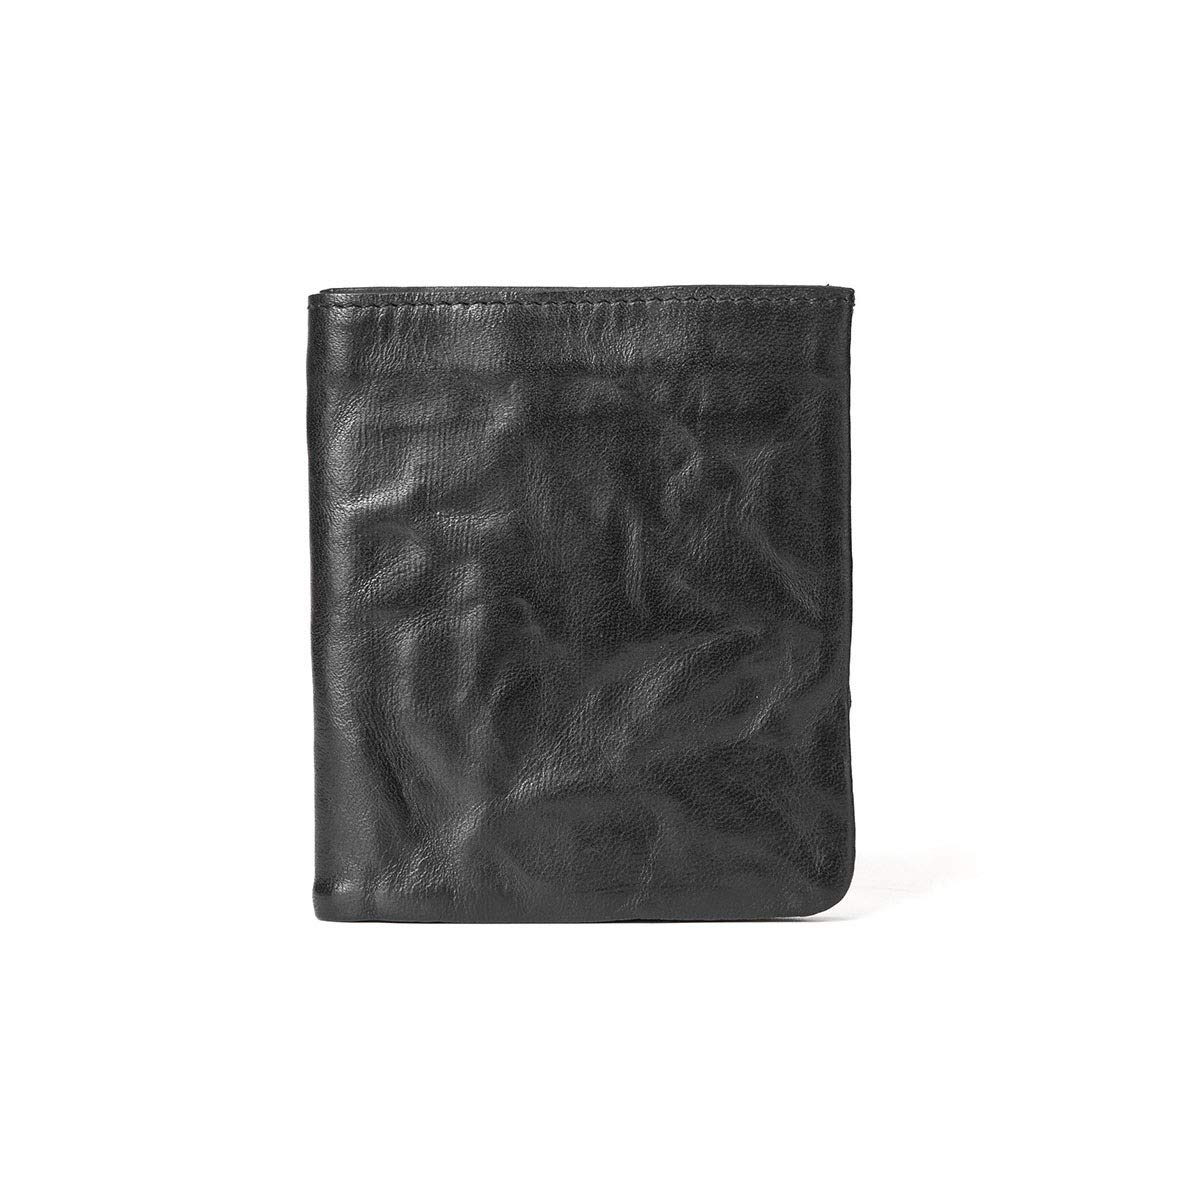 103e59af3e Black Yikuo Men's And Women's Brown Vintage Wallet Wallet Wallet Leather,  Size 10.5 9 1 Cm Multiple interlayer 719490